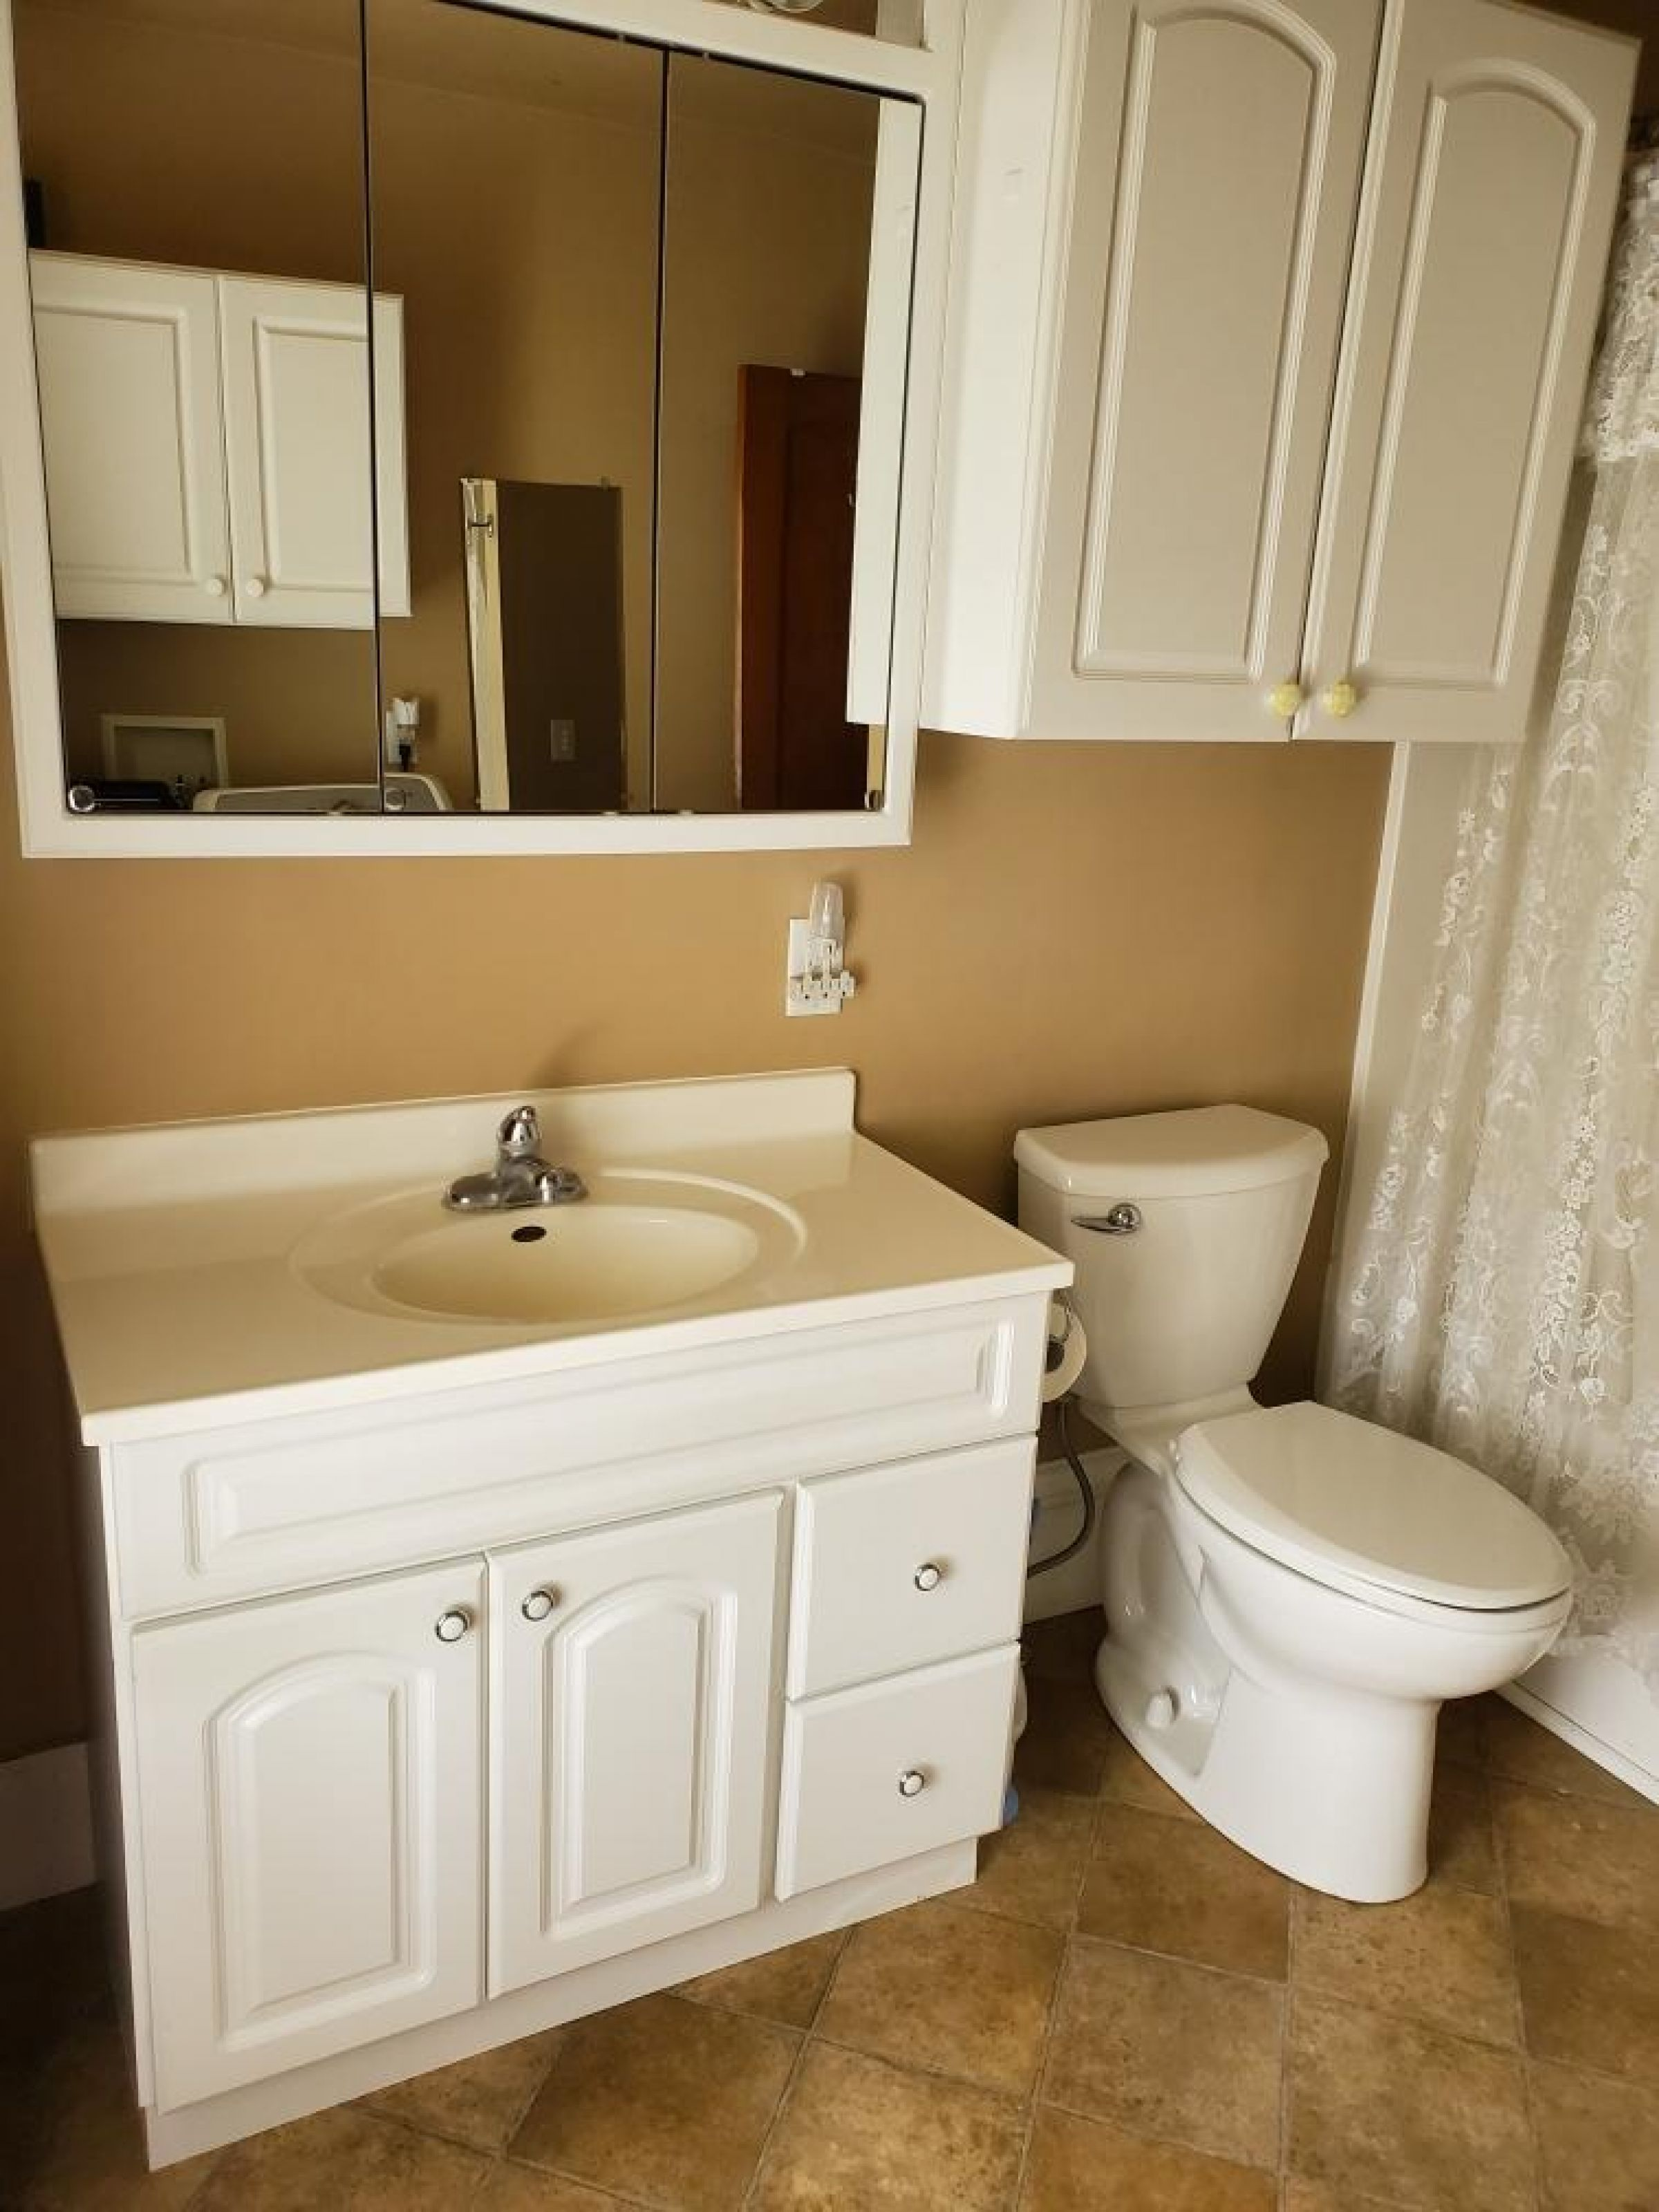 residential-land-mcleod-county-minnesota-80-acres-listing-number-15182-17-2020-09-23-163837.jpeg